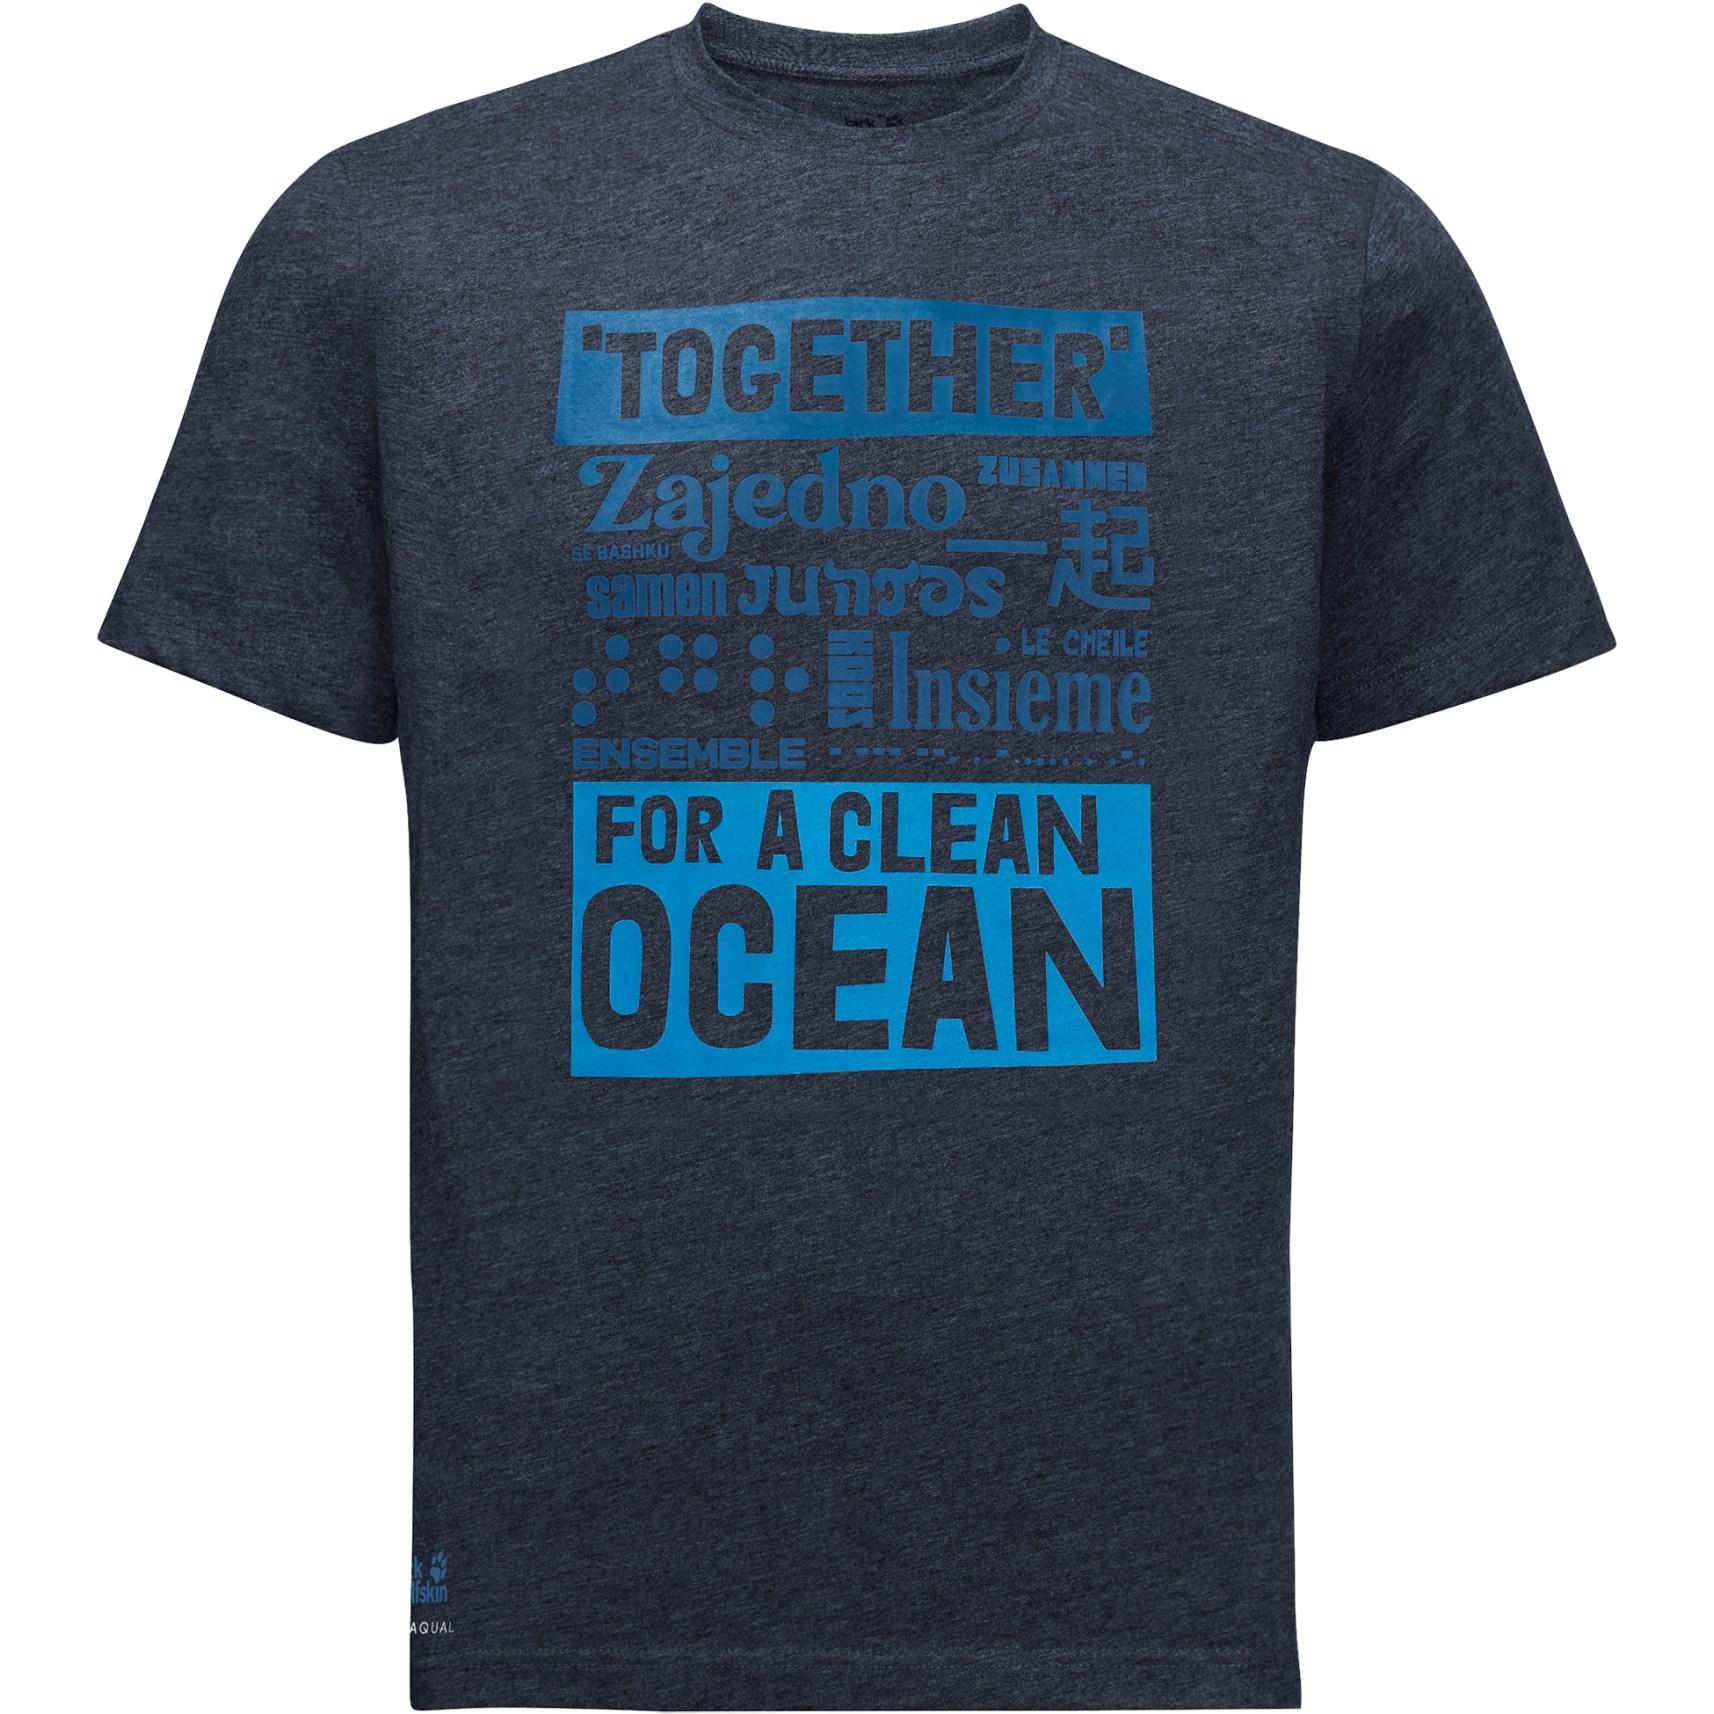 Jack Wolfskin Sea Ground T-Shirt - night blue